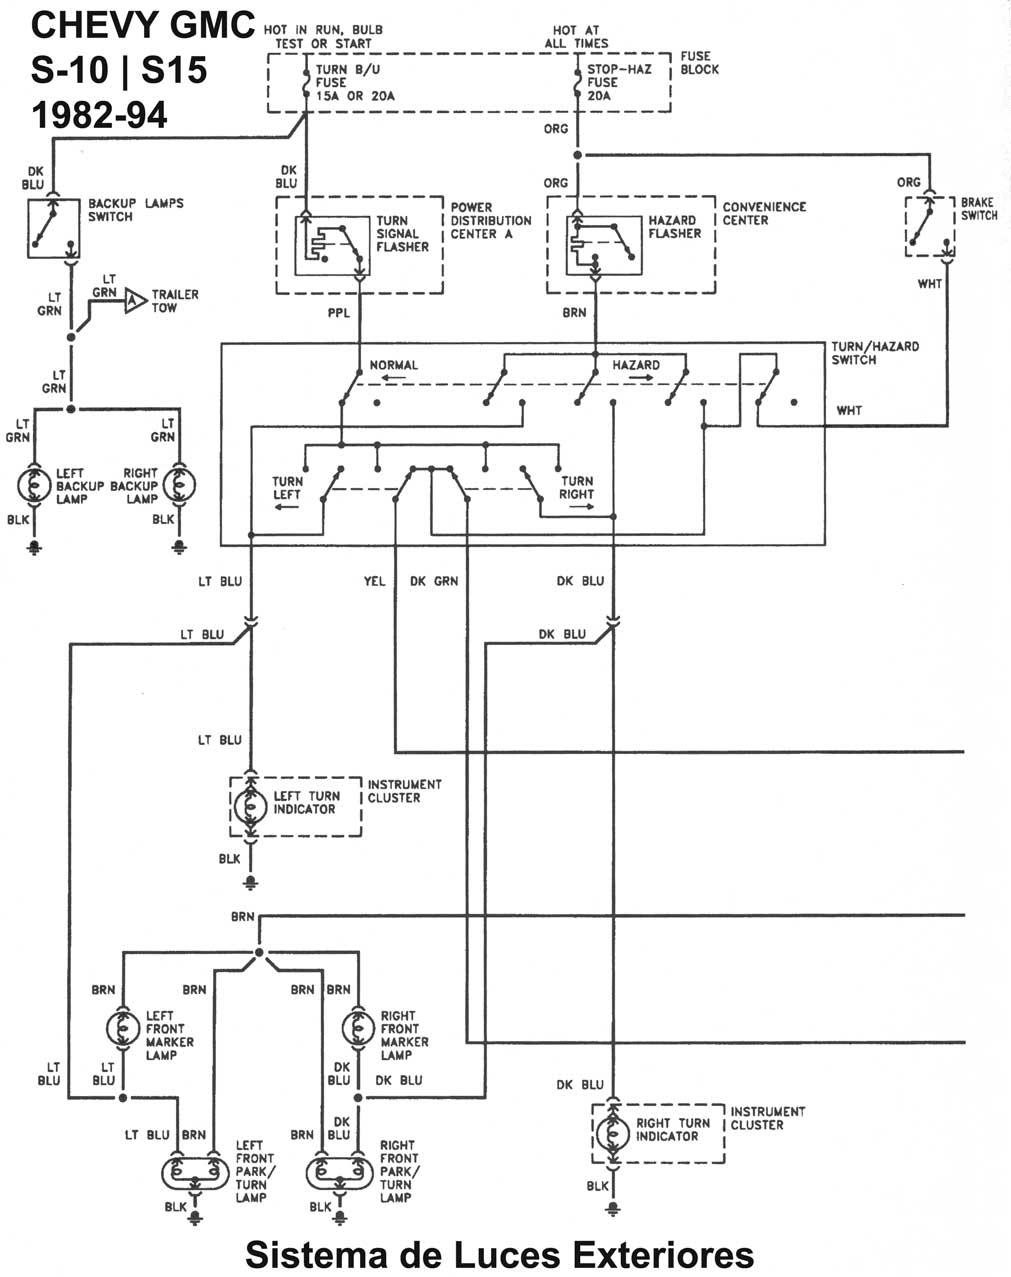 1986 Z28 Fuse Box Great Design Of Wiring Diagram \u2022 1986 Camaro Fuse  Box 1986 Z28 Fuse Box